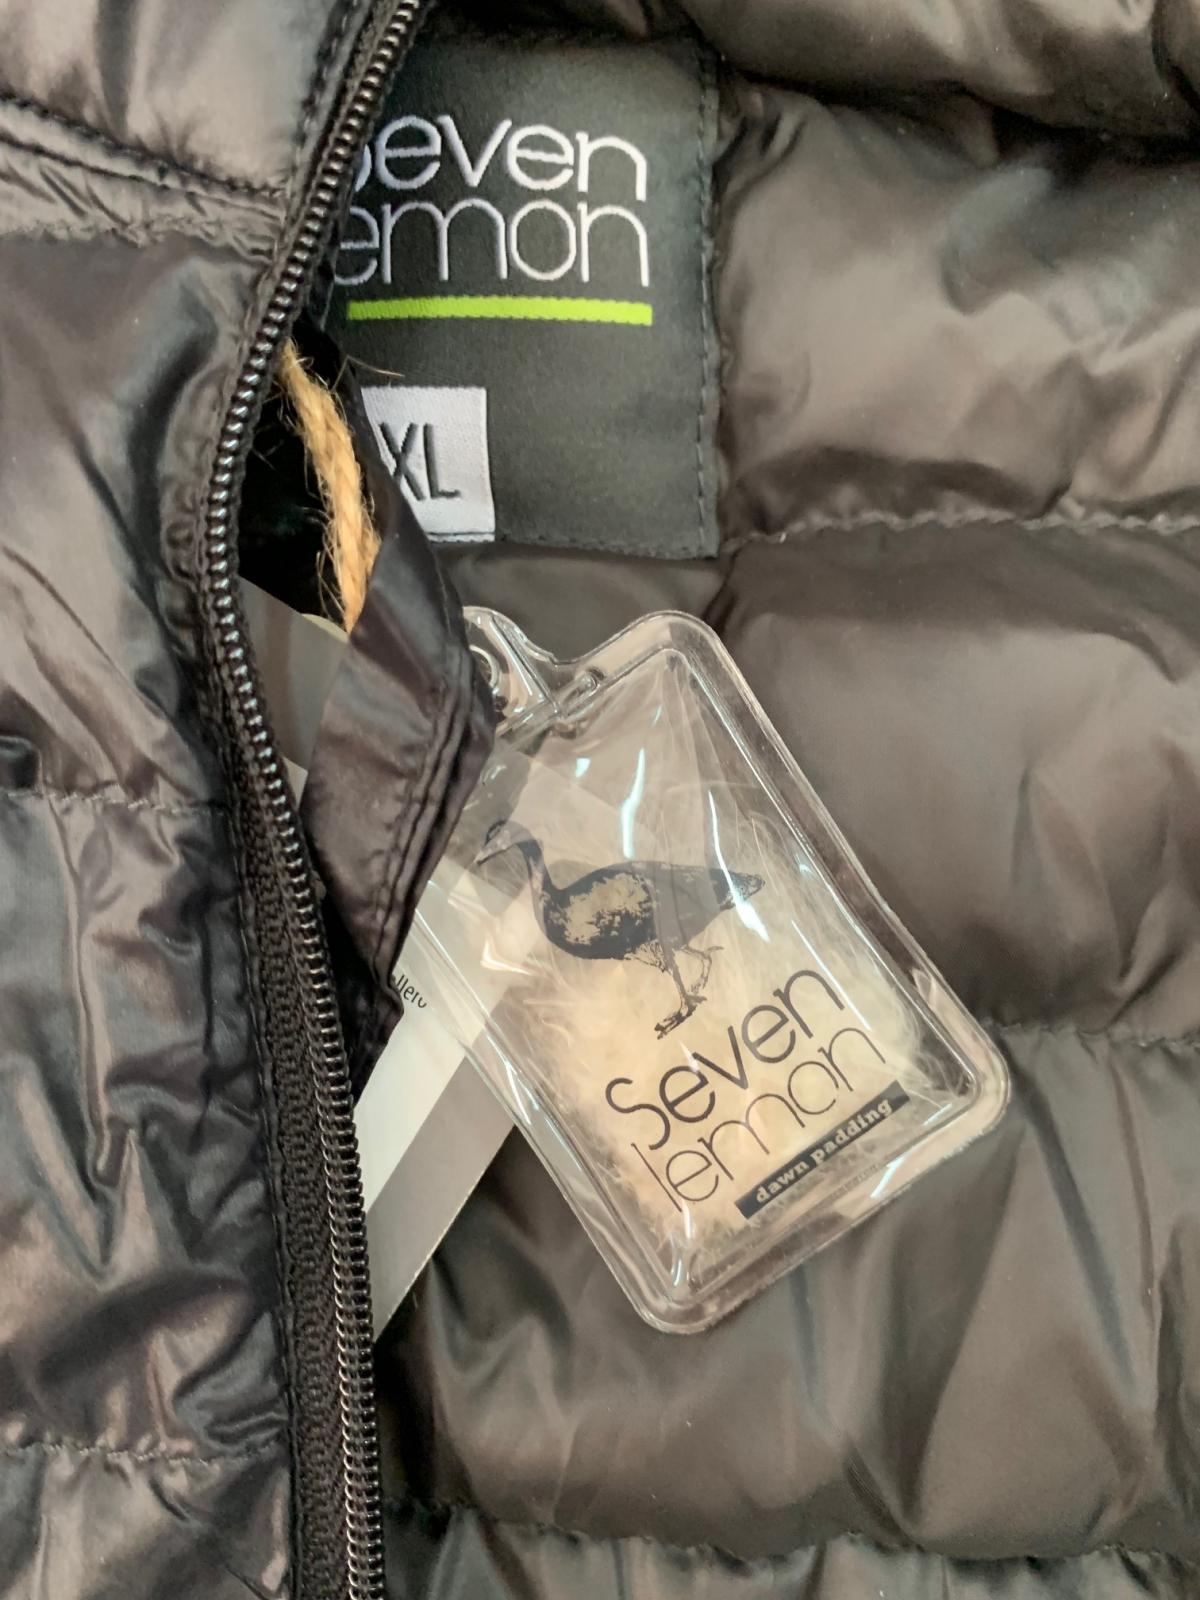 Мужская практичная куртка от Seven lemon